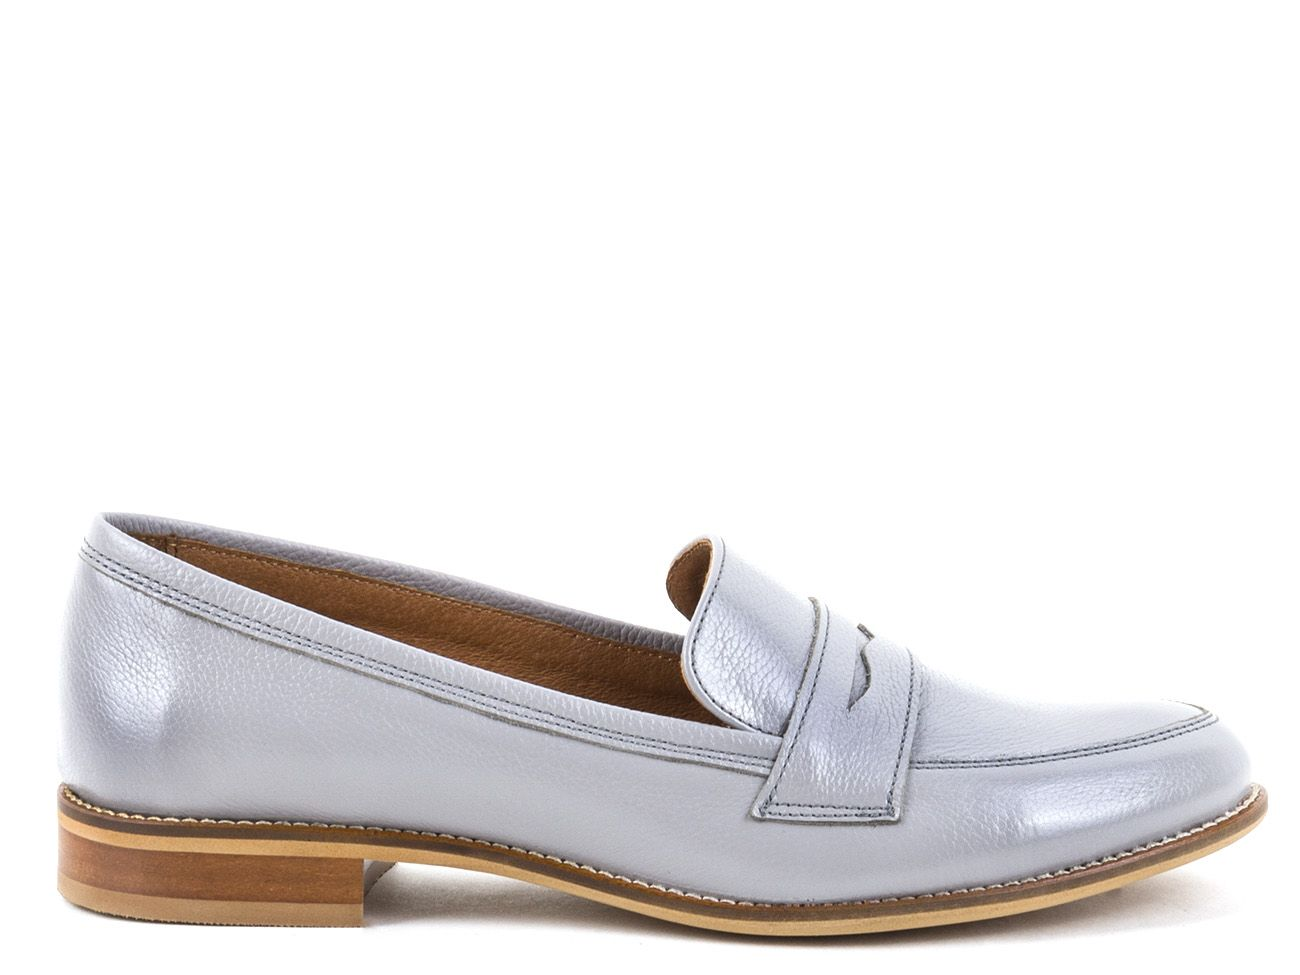 Szare Mokasyny Akardo Pl Porzadne Buty Robione W Polsce Dress Shoes Men Loafers Men Oxford Shoes